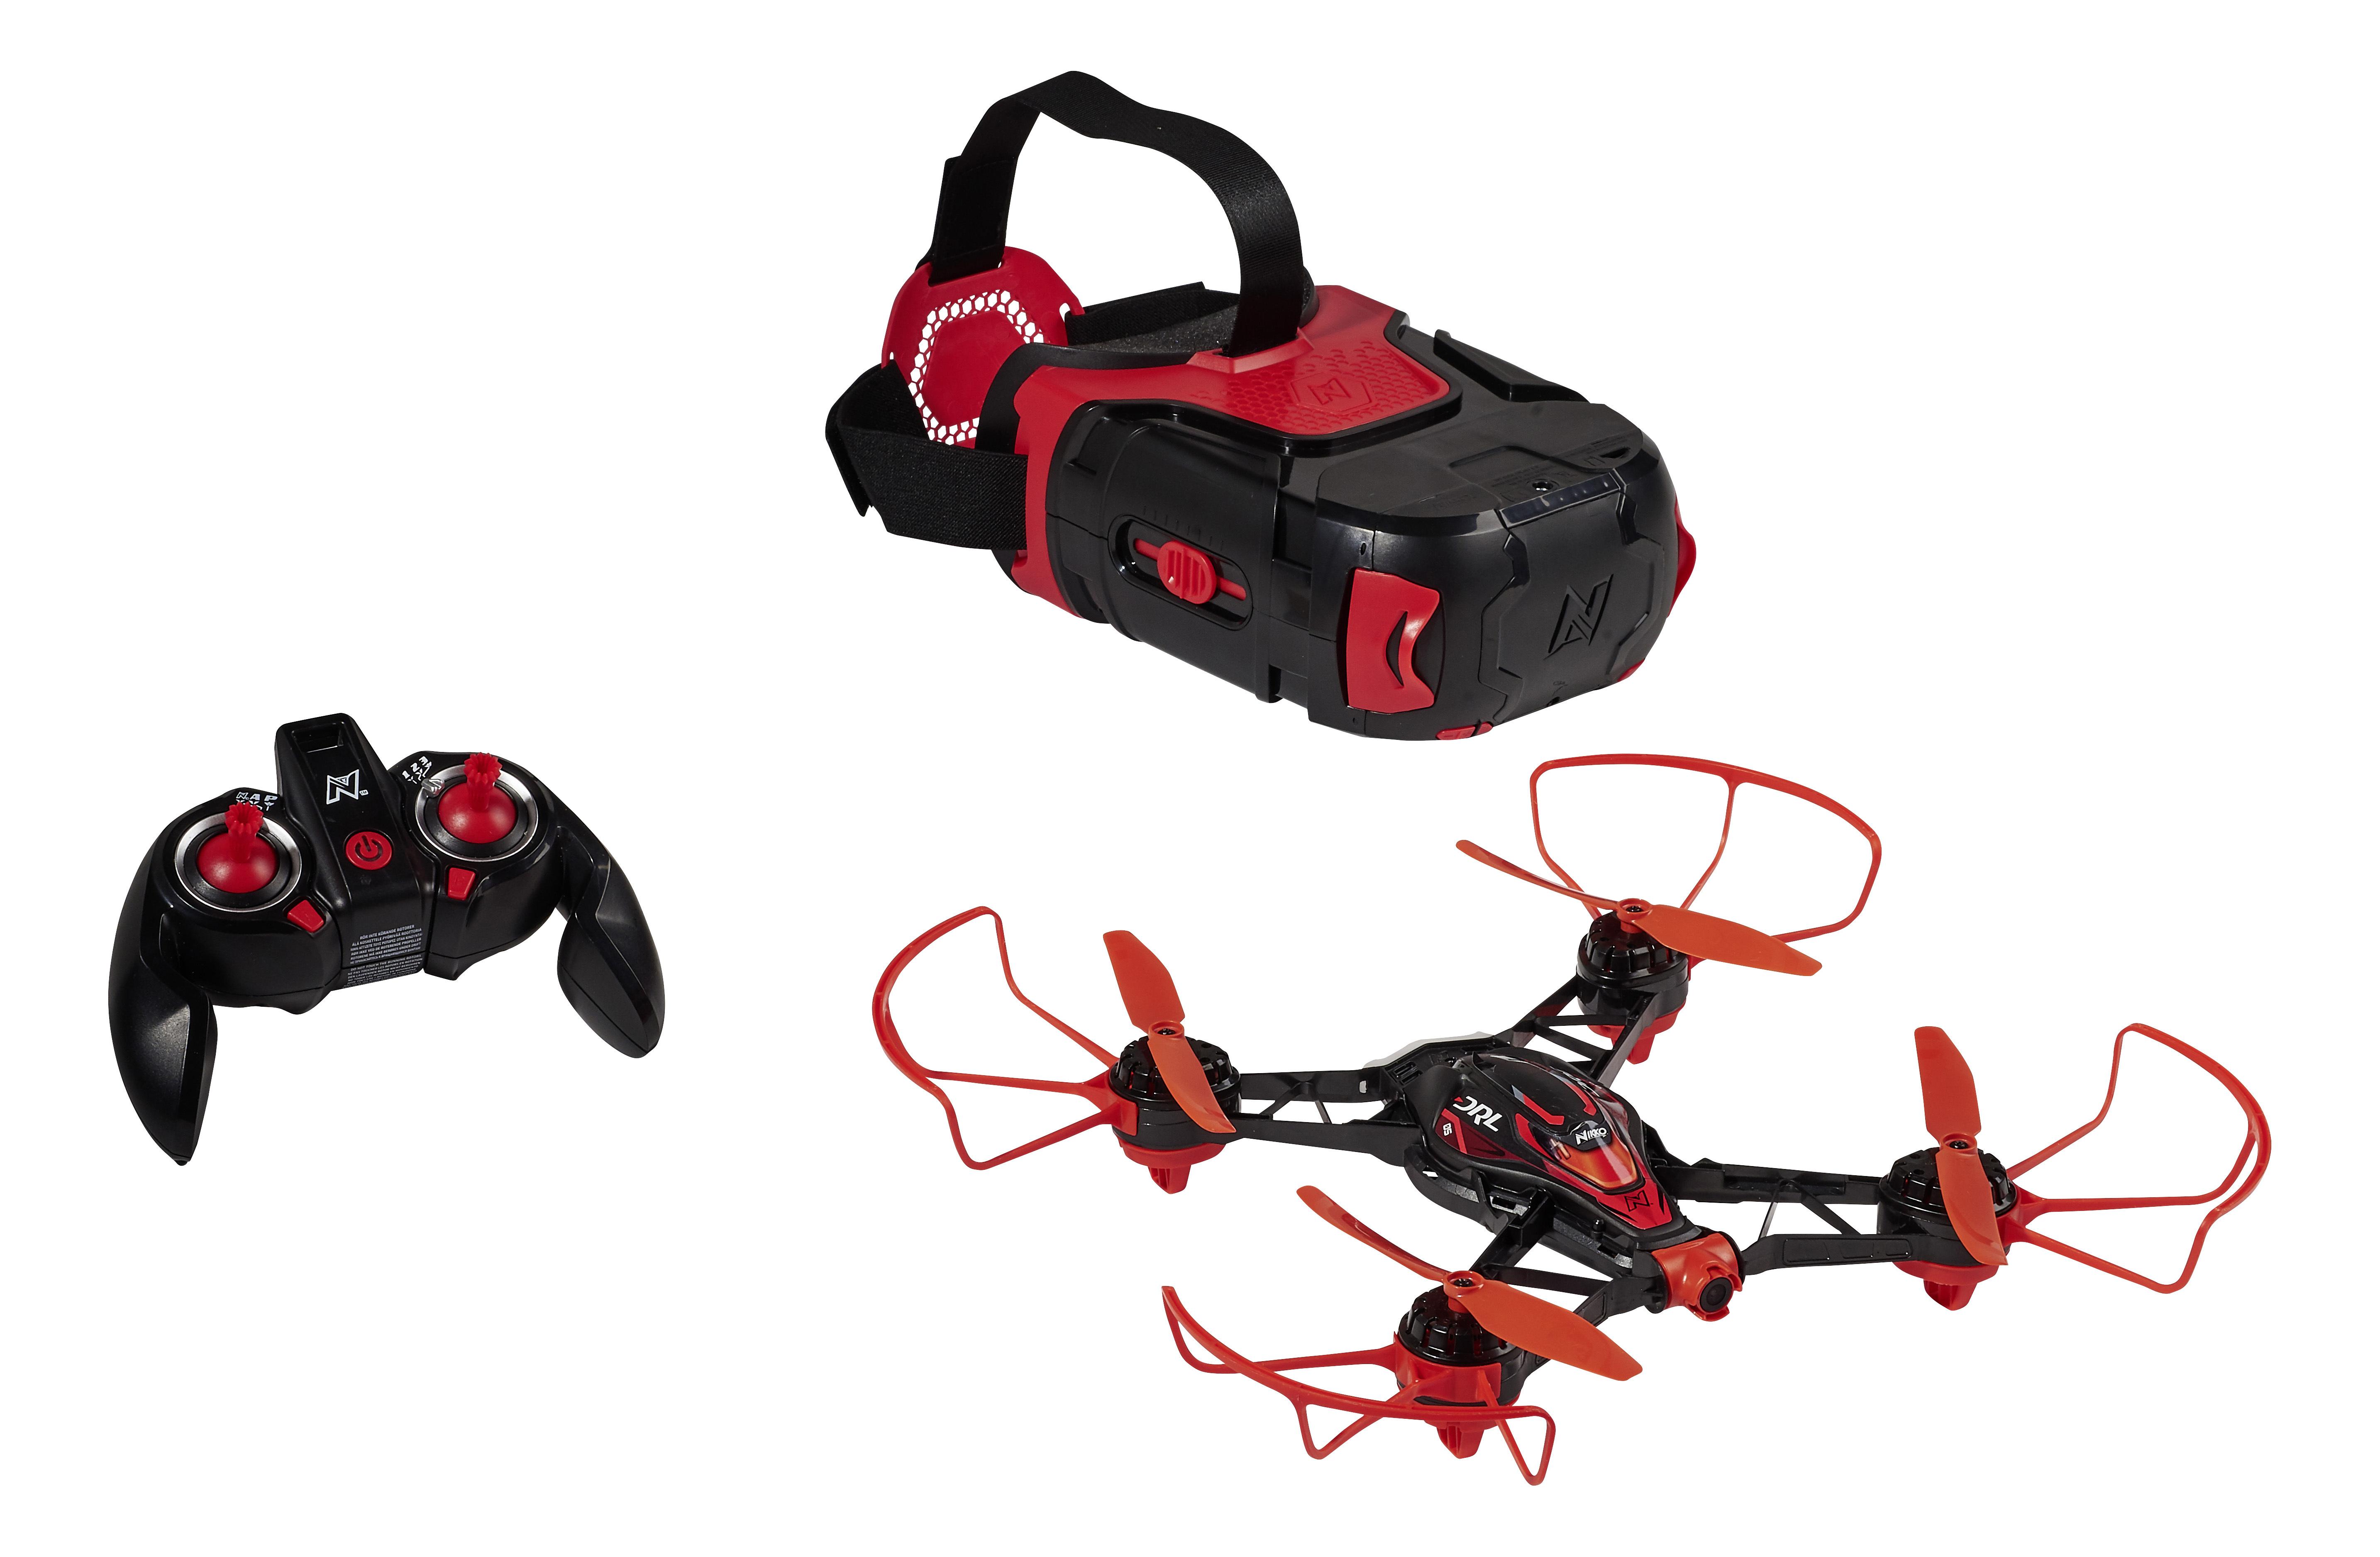 dronex pro bewertung